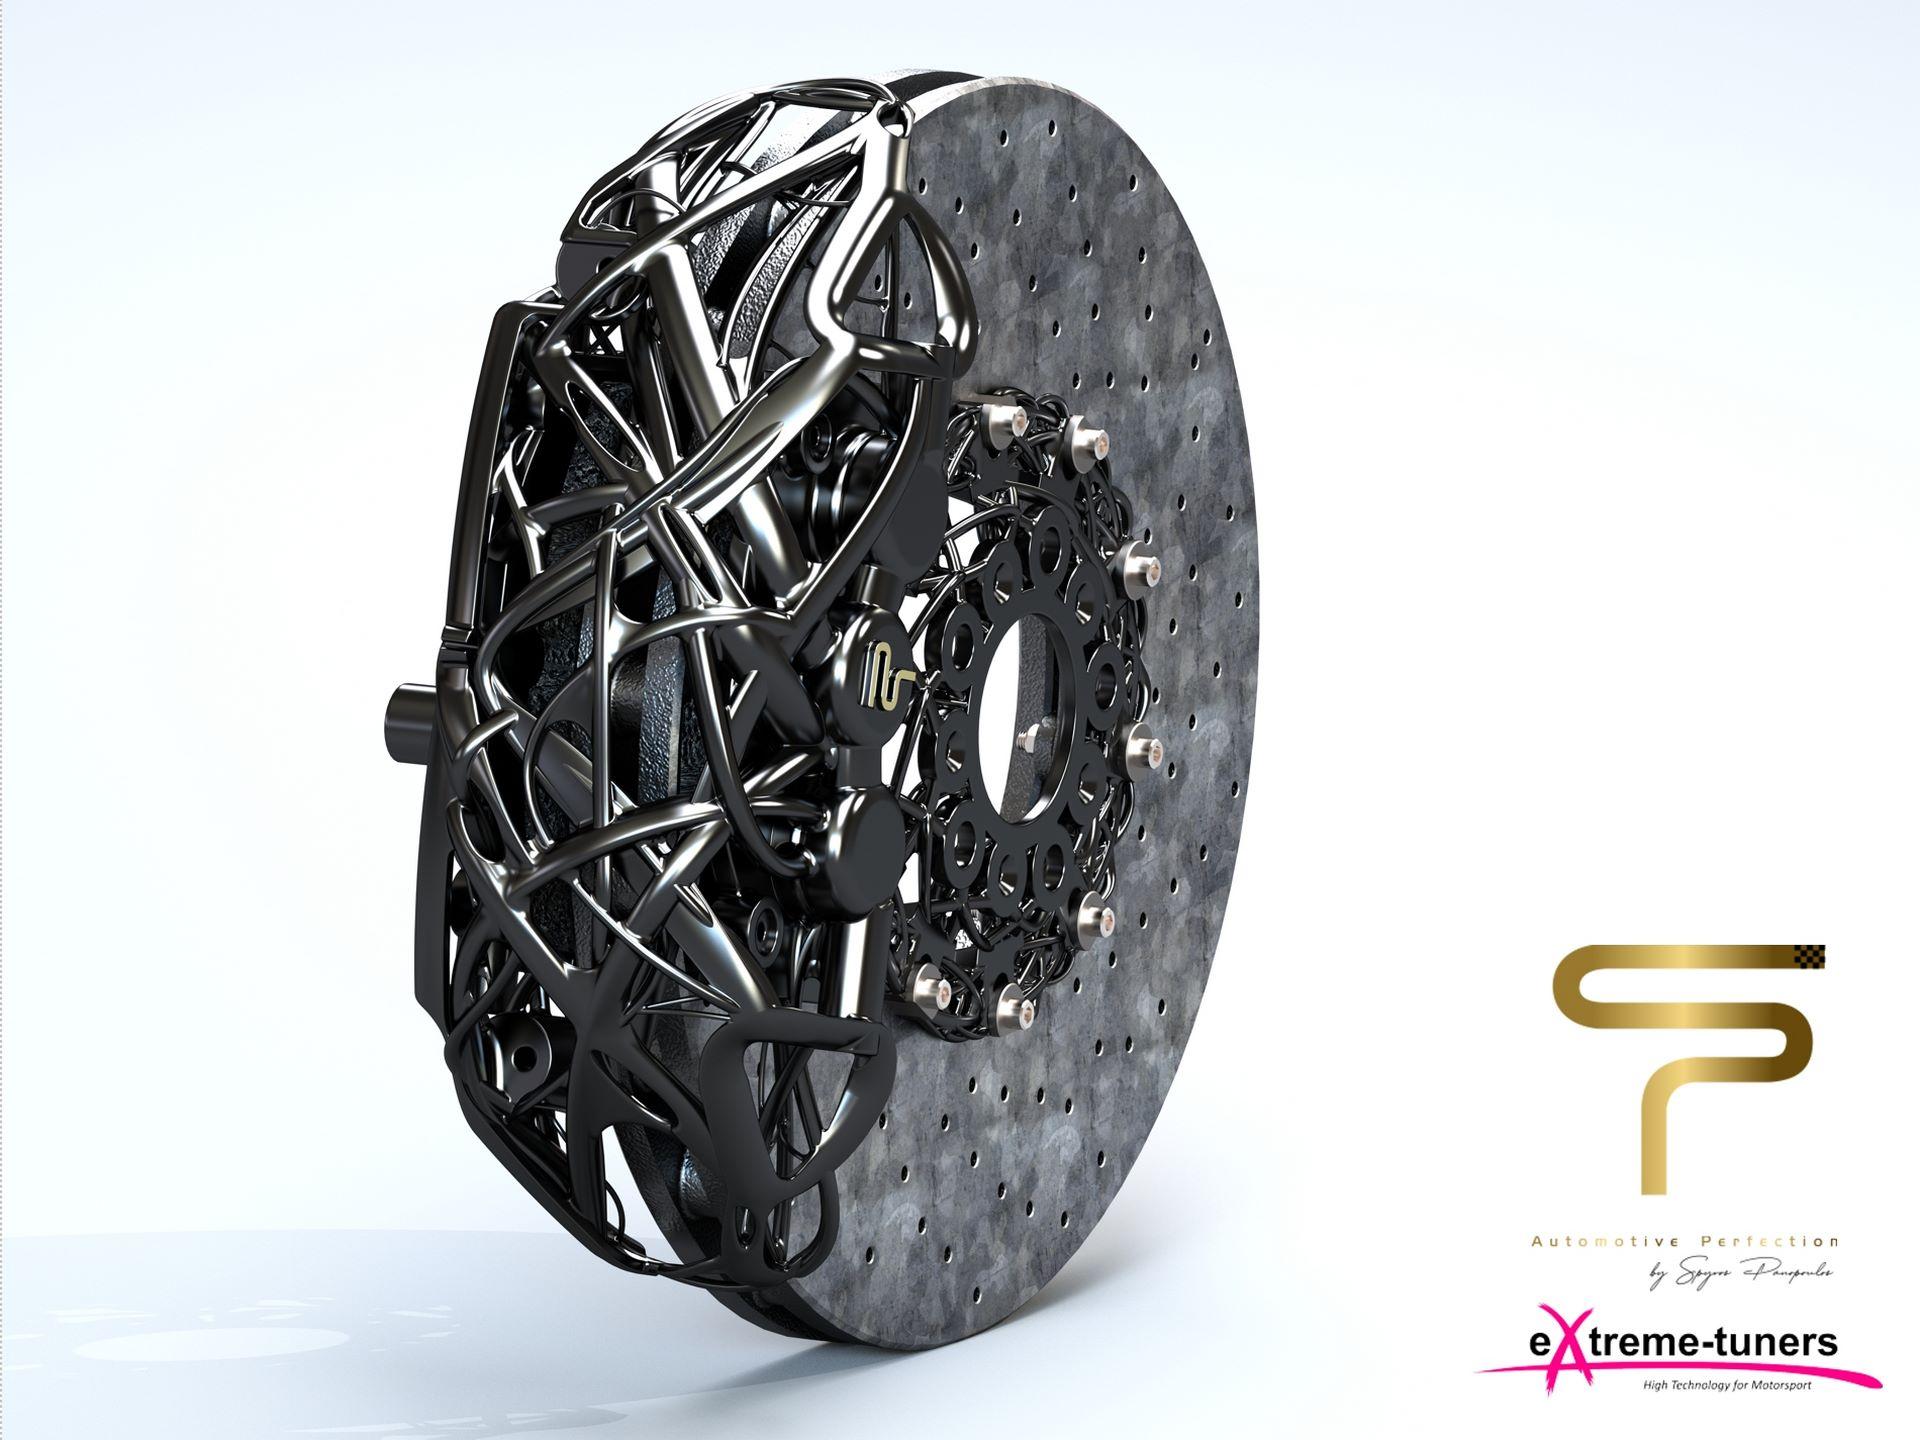 Spyros-Panopoulos-Automotive-Chaos-9